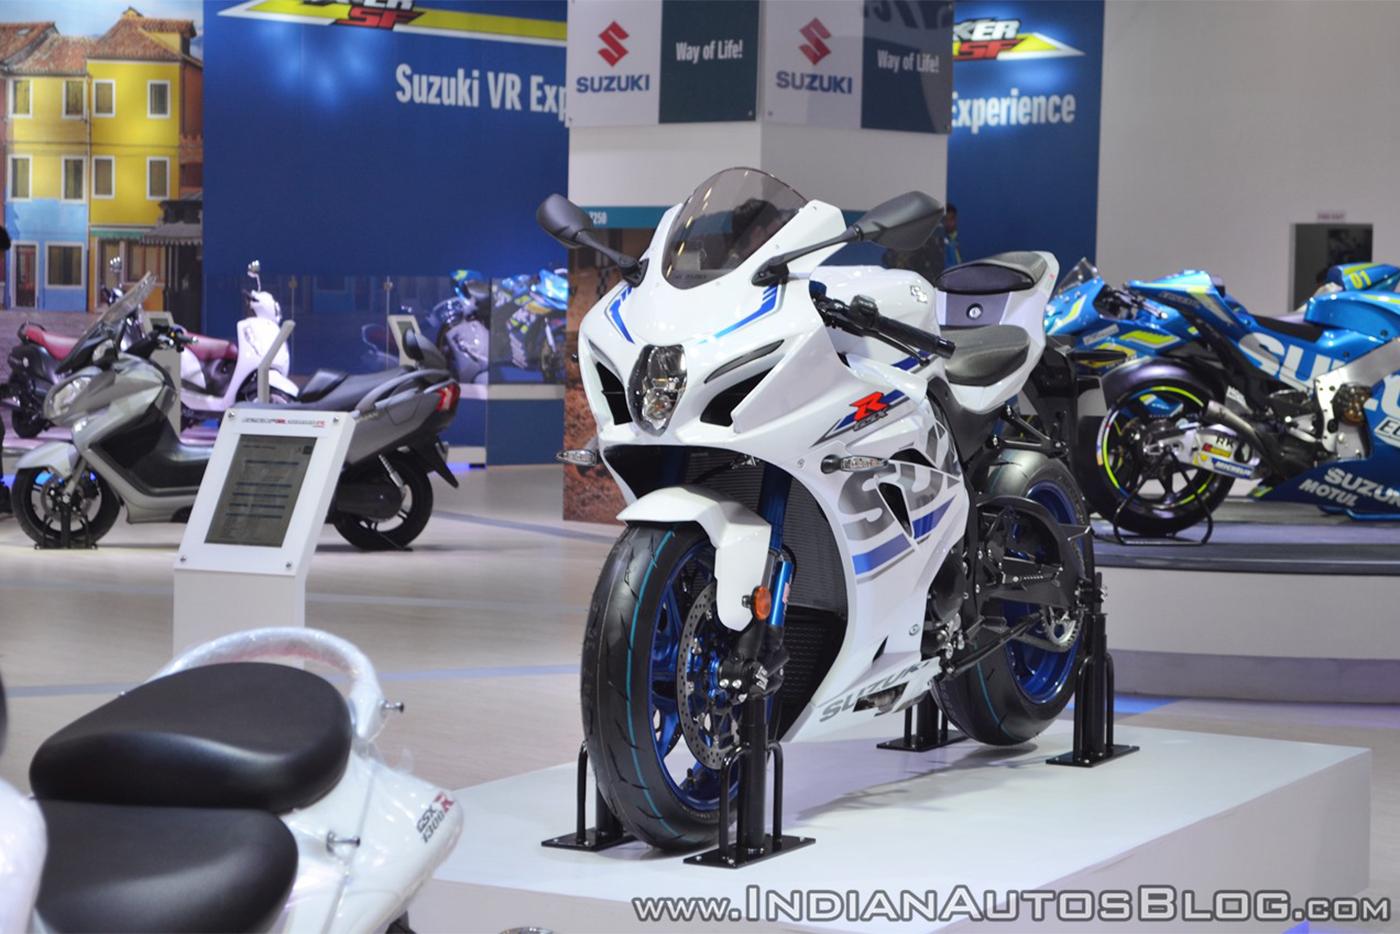 2018-suzuki-gsx-r1000r-white-front-left-quarter-at-2018-auto-expo.jpg